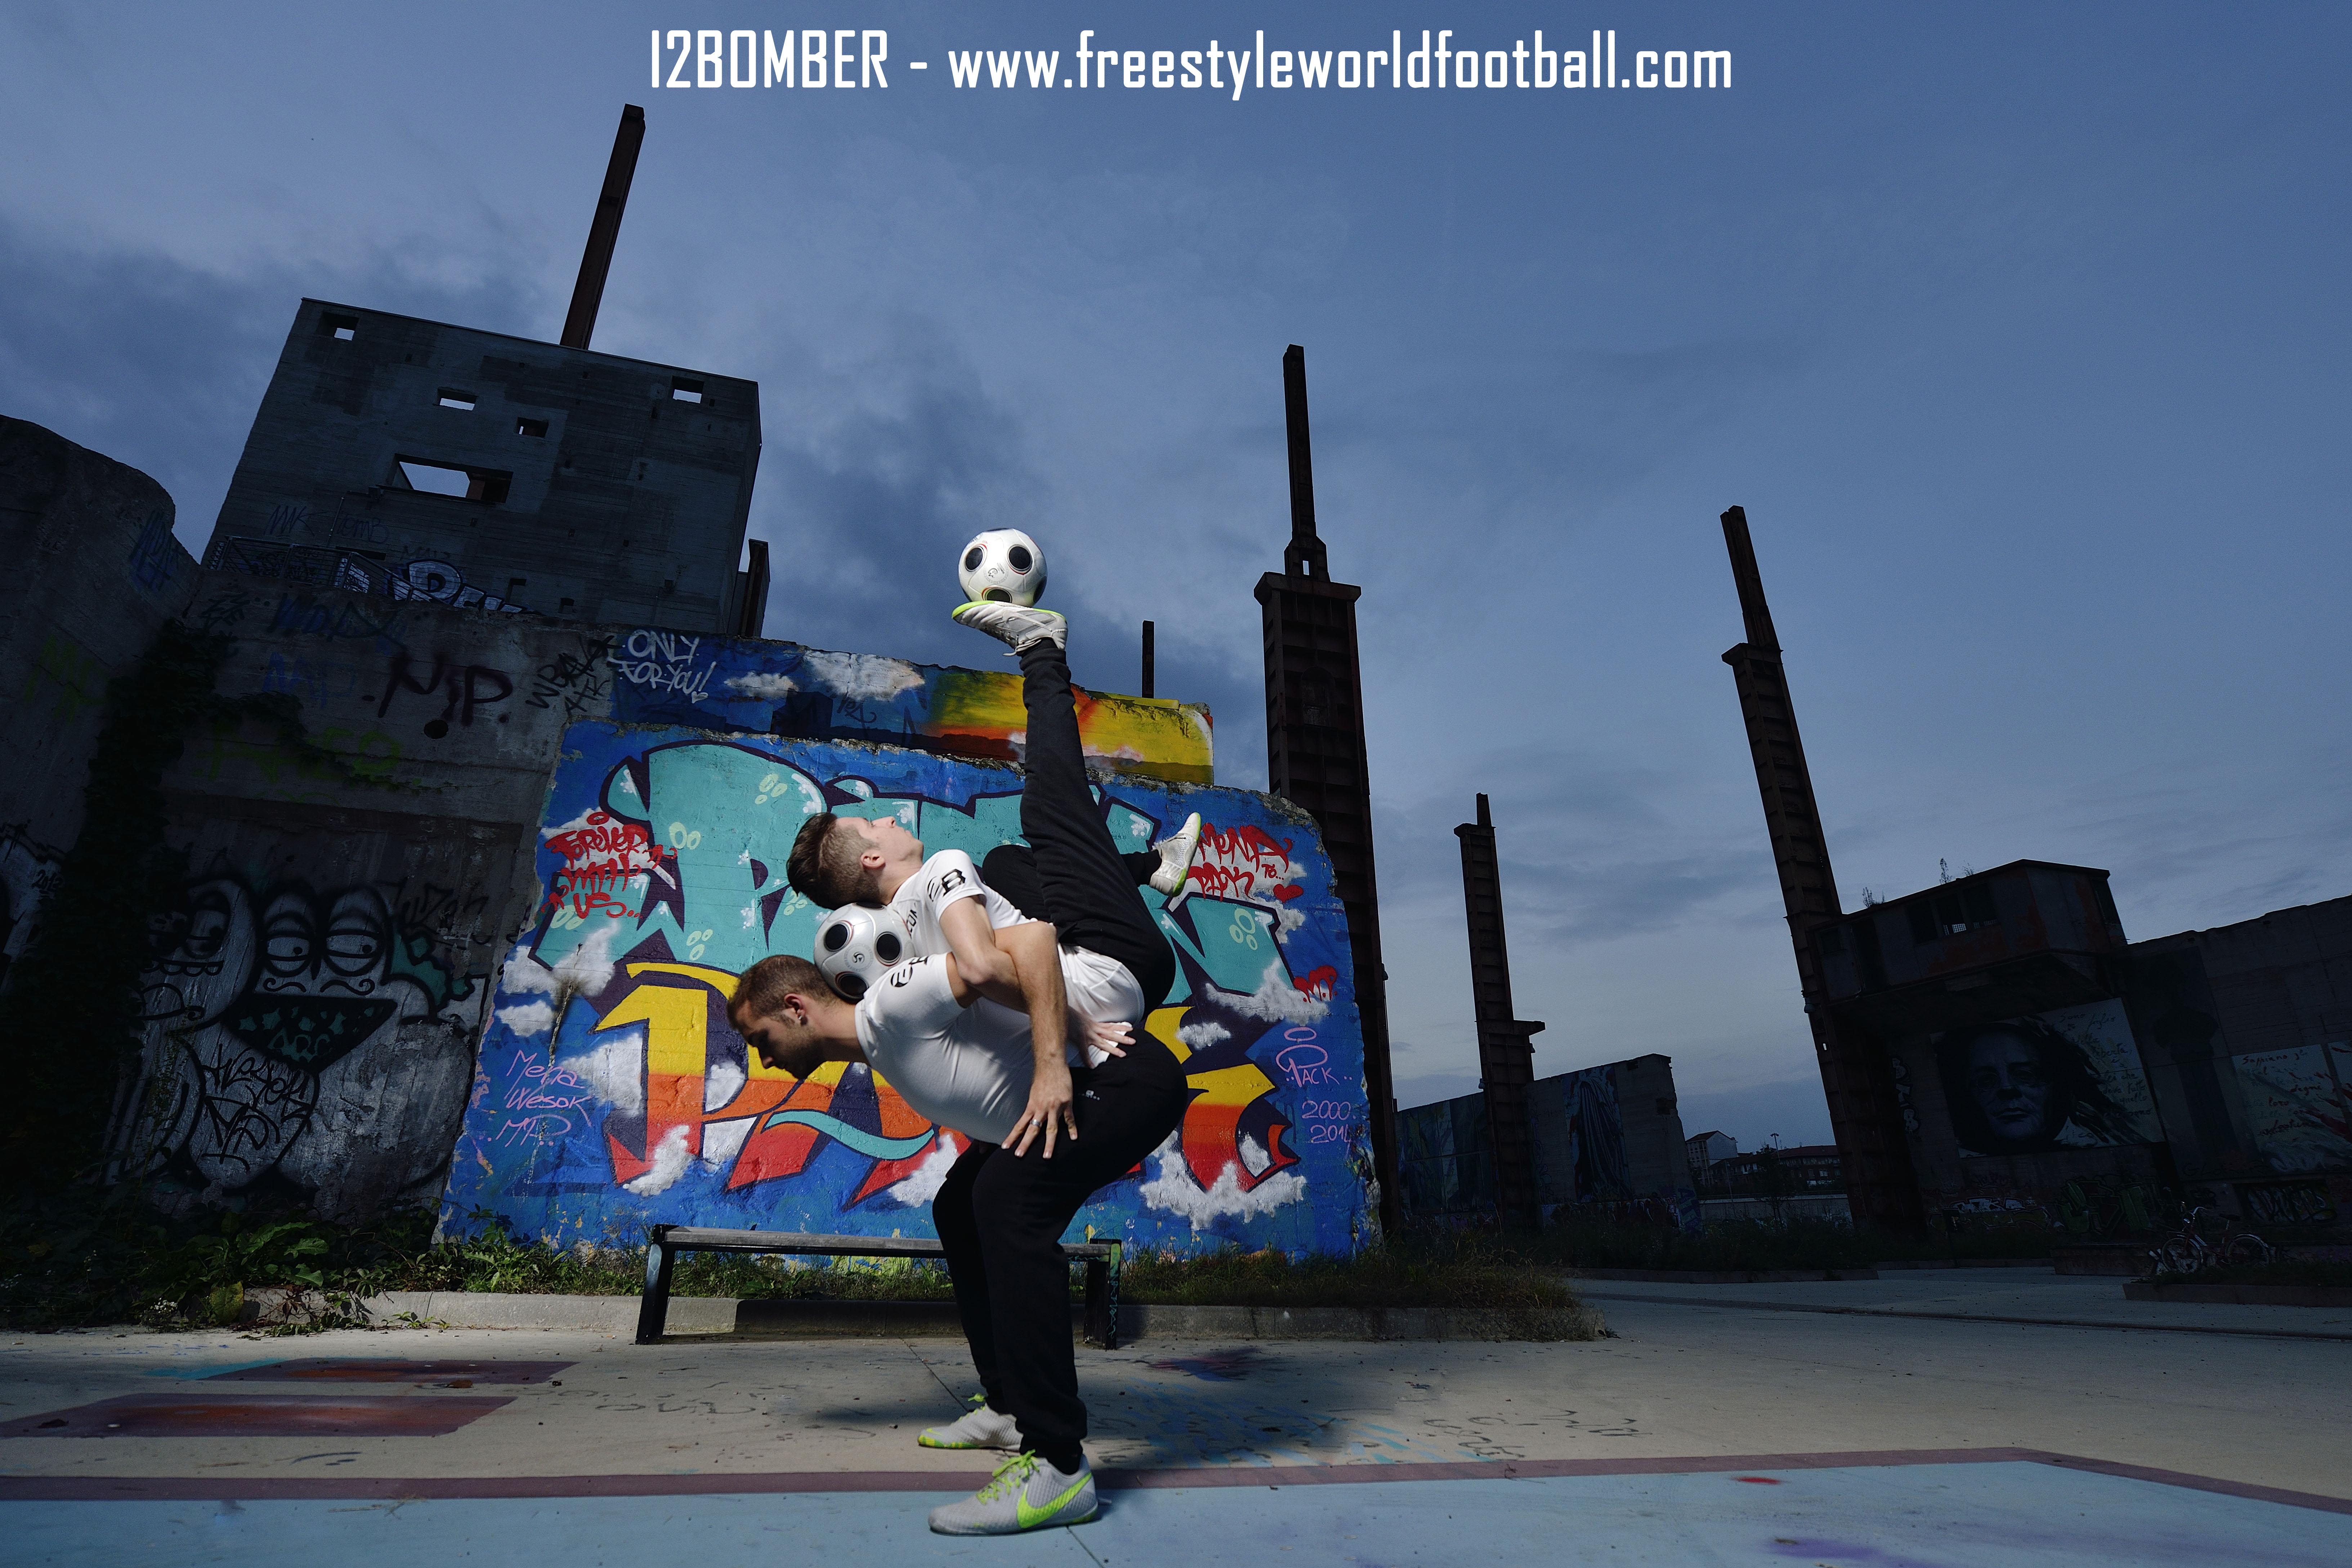 I2BOMBER - 001 - www.freestyleworldfootball.com.jpg